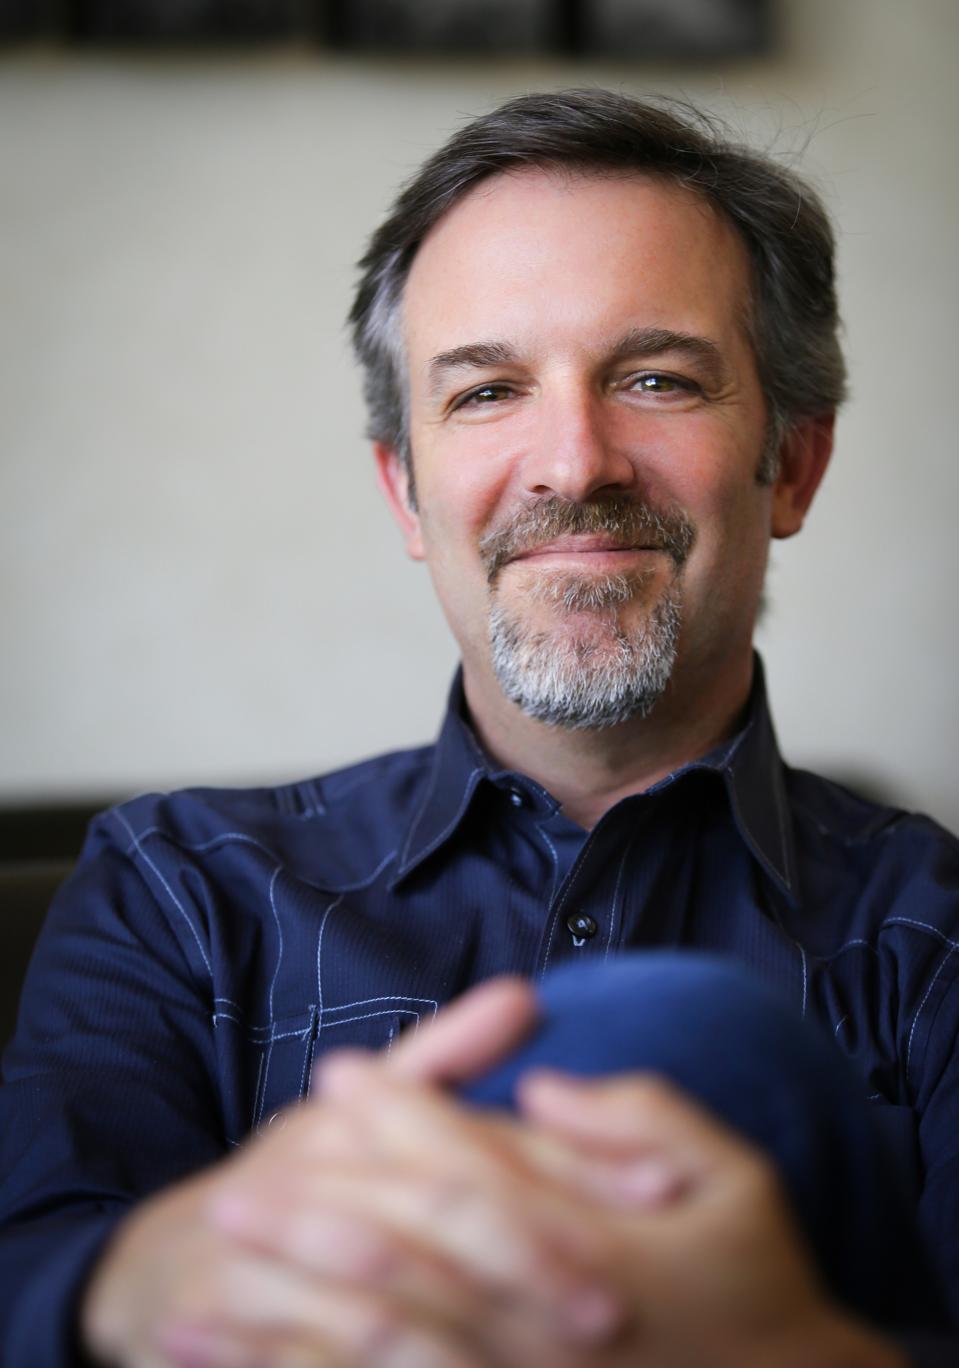 A headshot of a man in a blue shirt, Dr. Dan Peters.